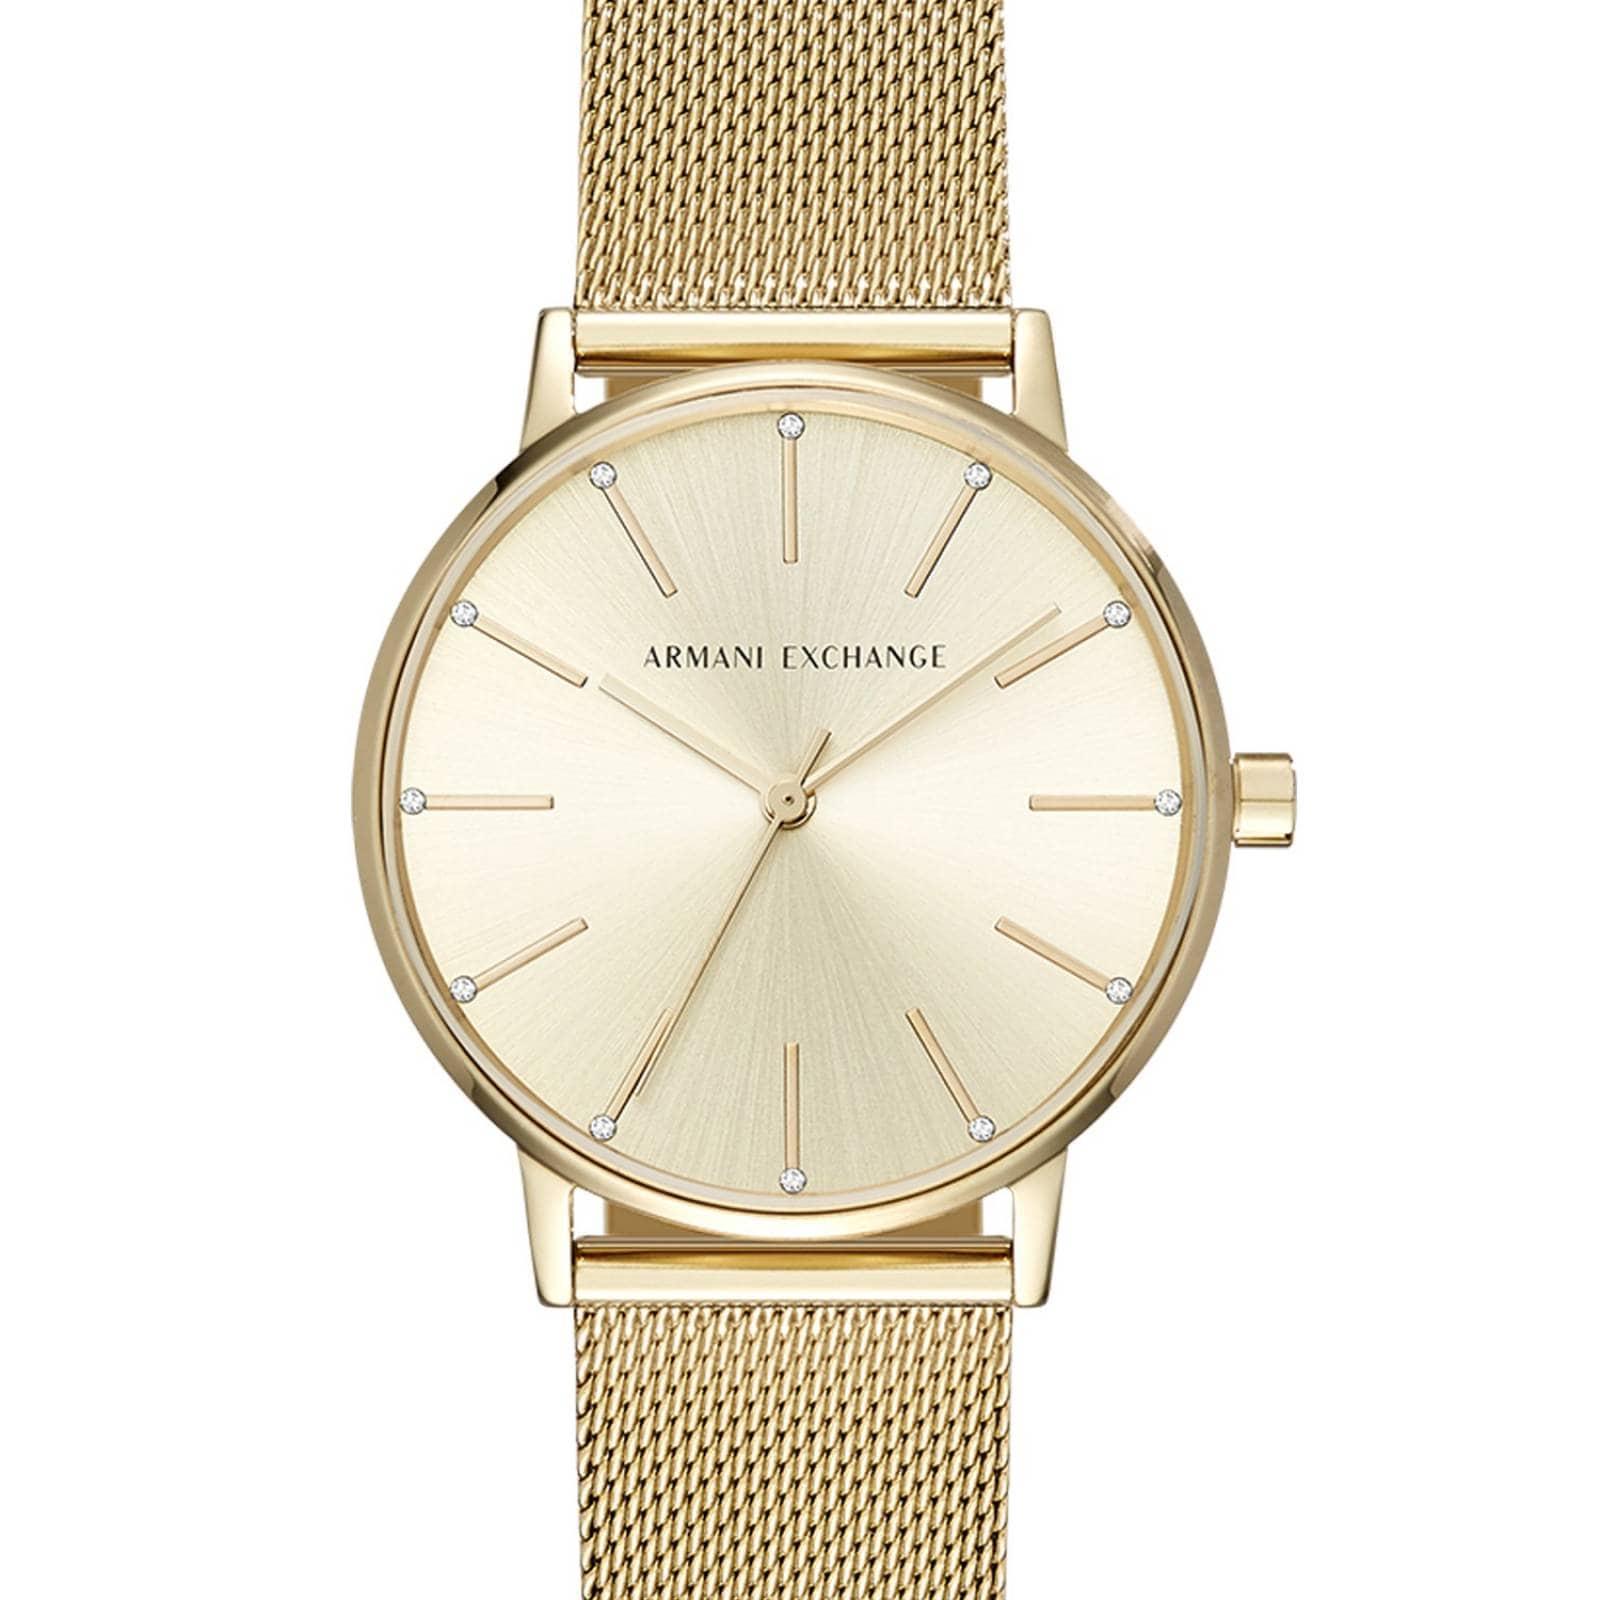 573726262494 Reloj armani exchange dama